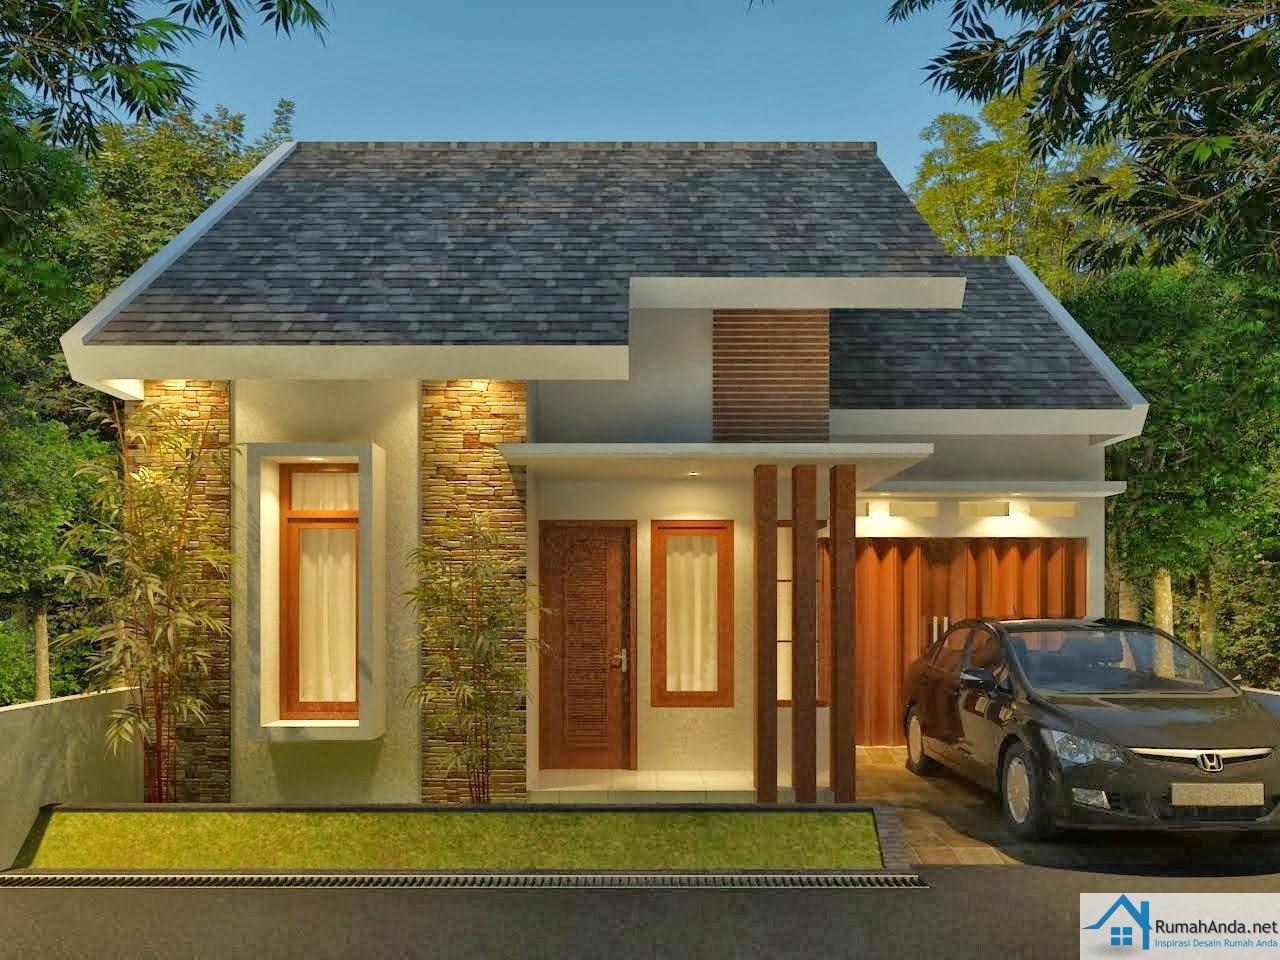 107 Desain Rumah Modern Minimalis 1 Lantai 2015 Gambar Desain